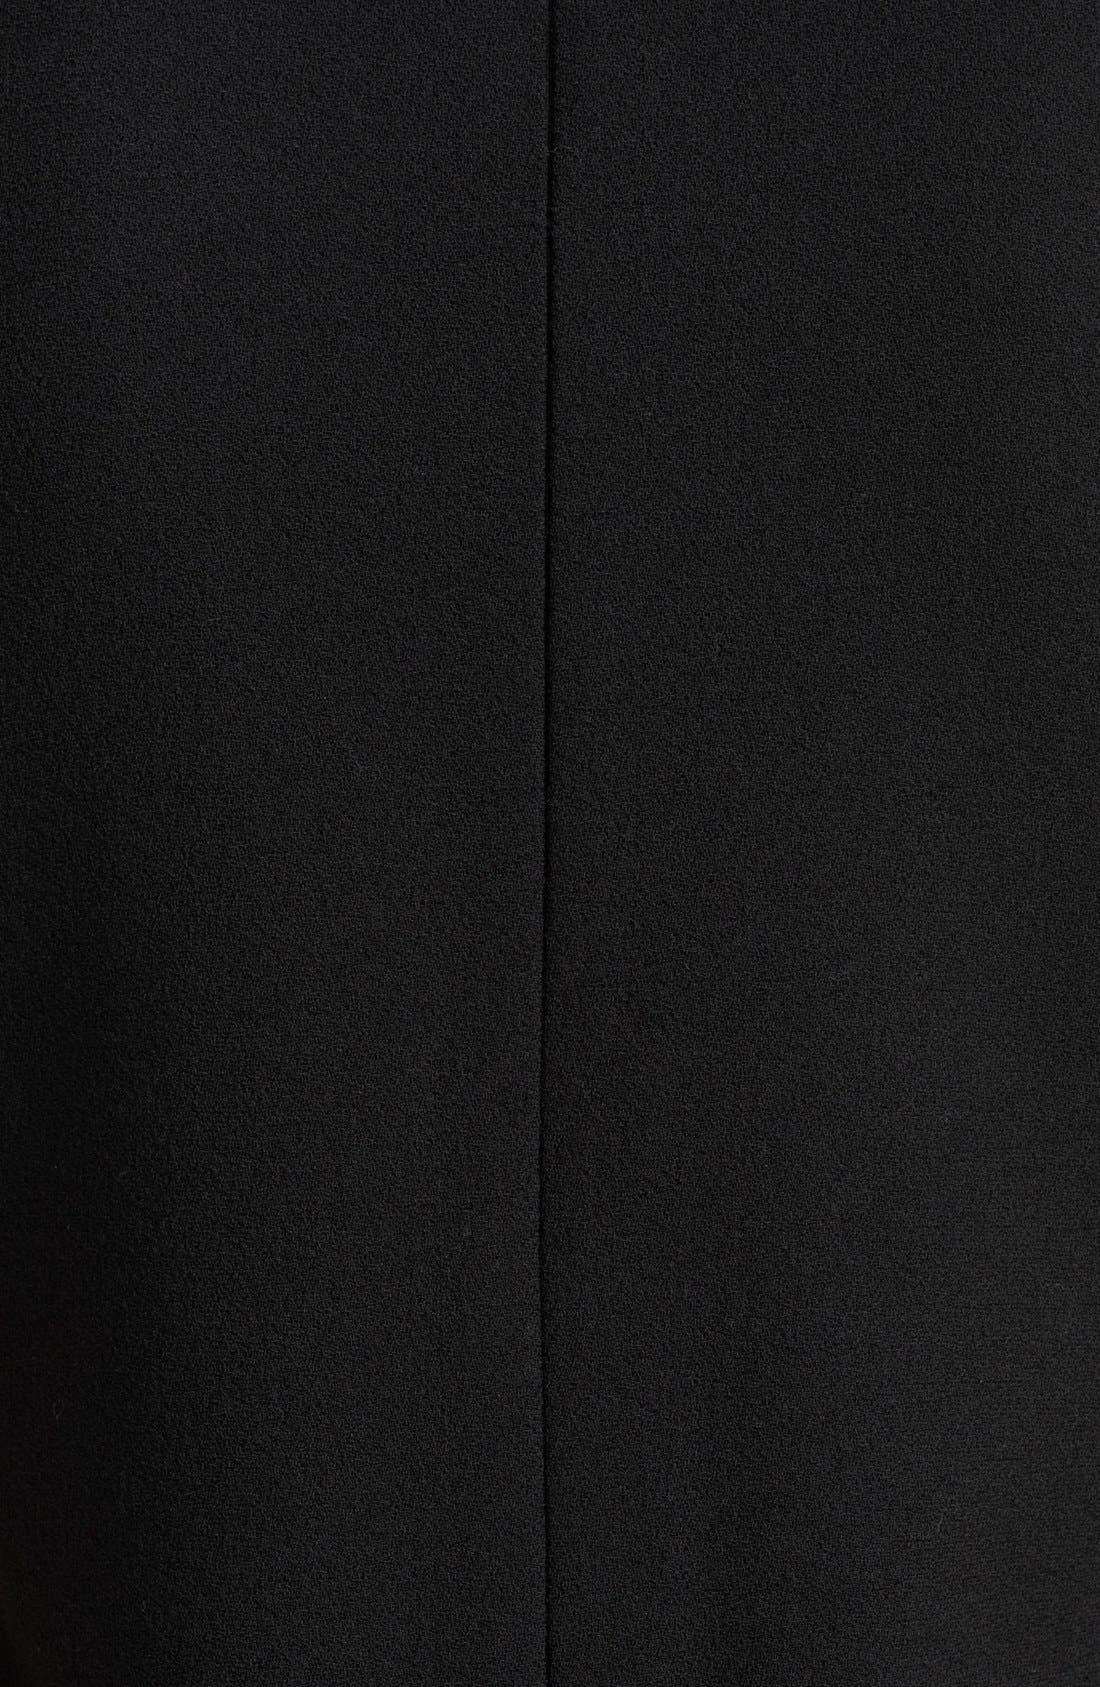 Alternate Image 3  - Christopher Kane Swarovski Crystal Detail Crepe Dress